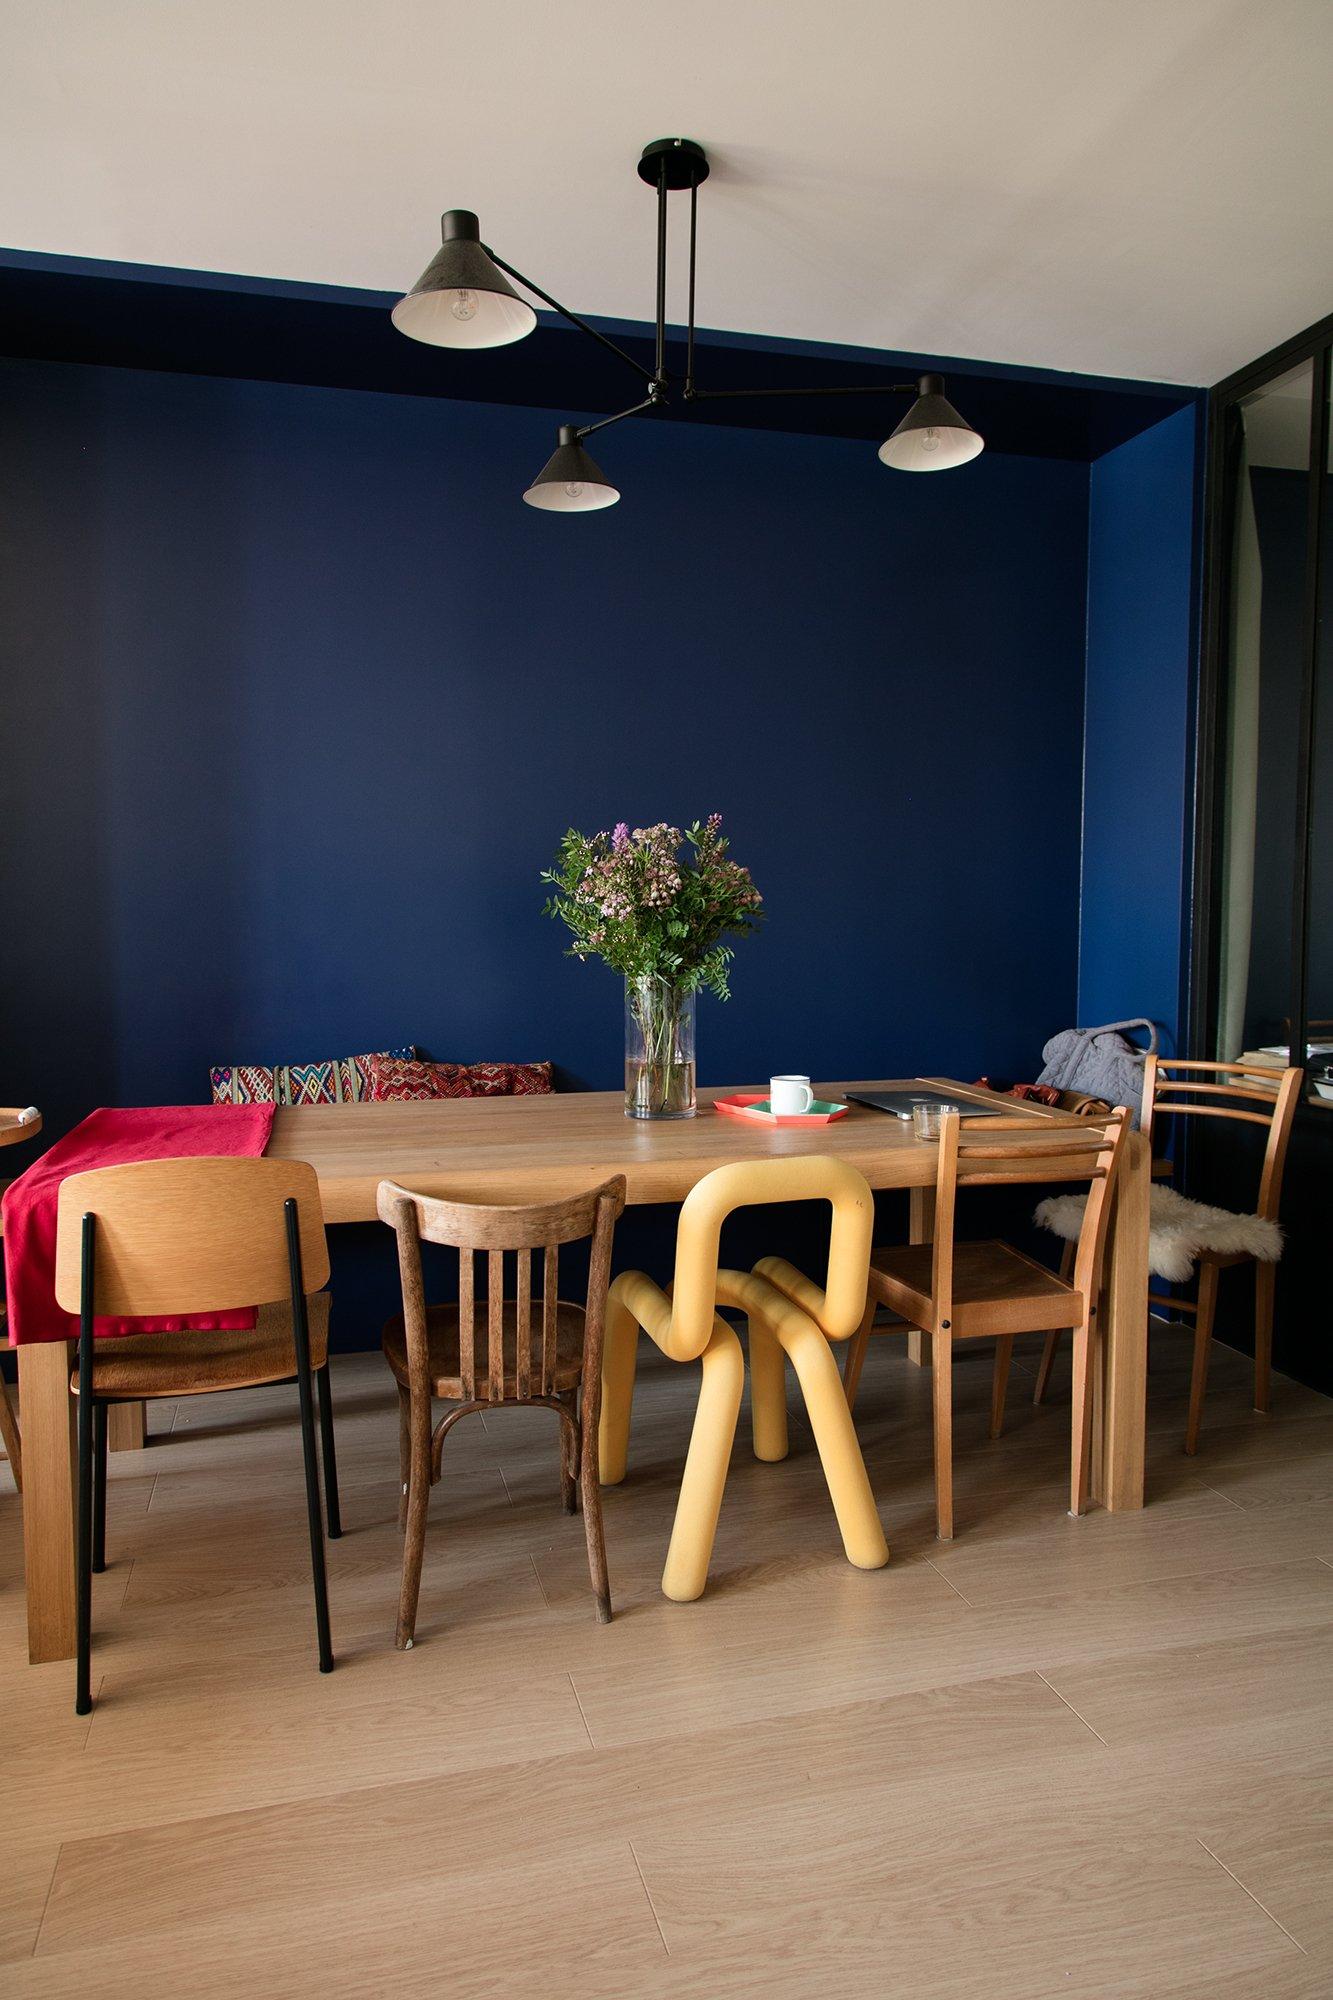 Salle à manger Bibliothèque bleue Appartement Marseille Emma et Ghislain Borga